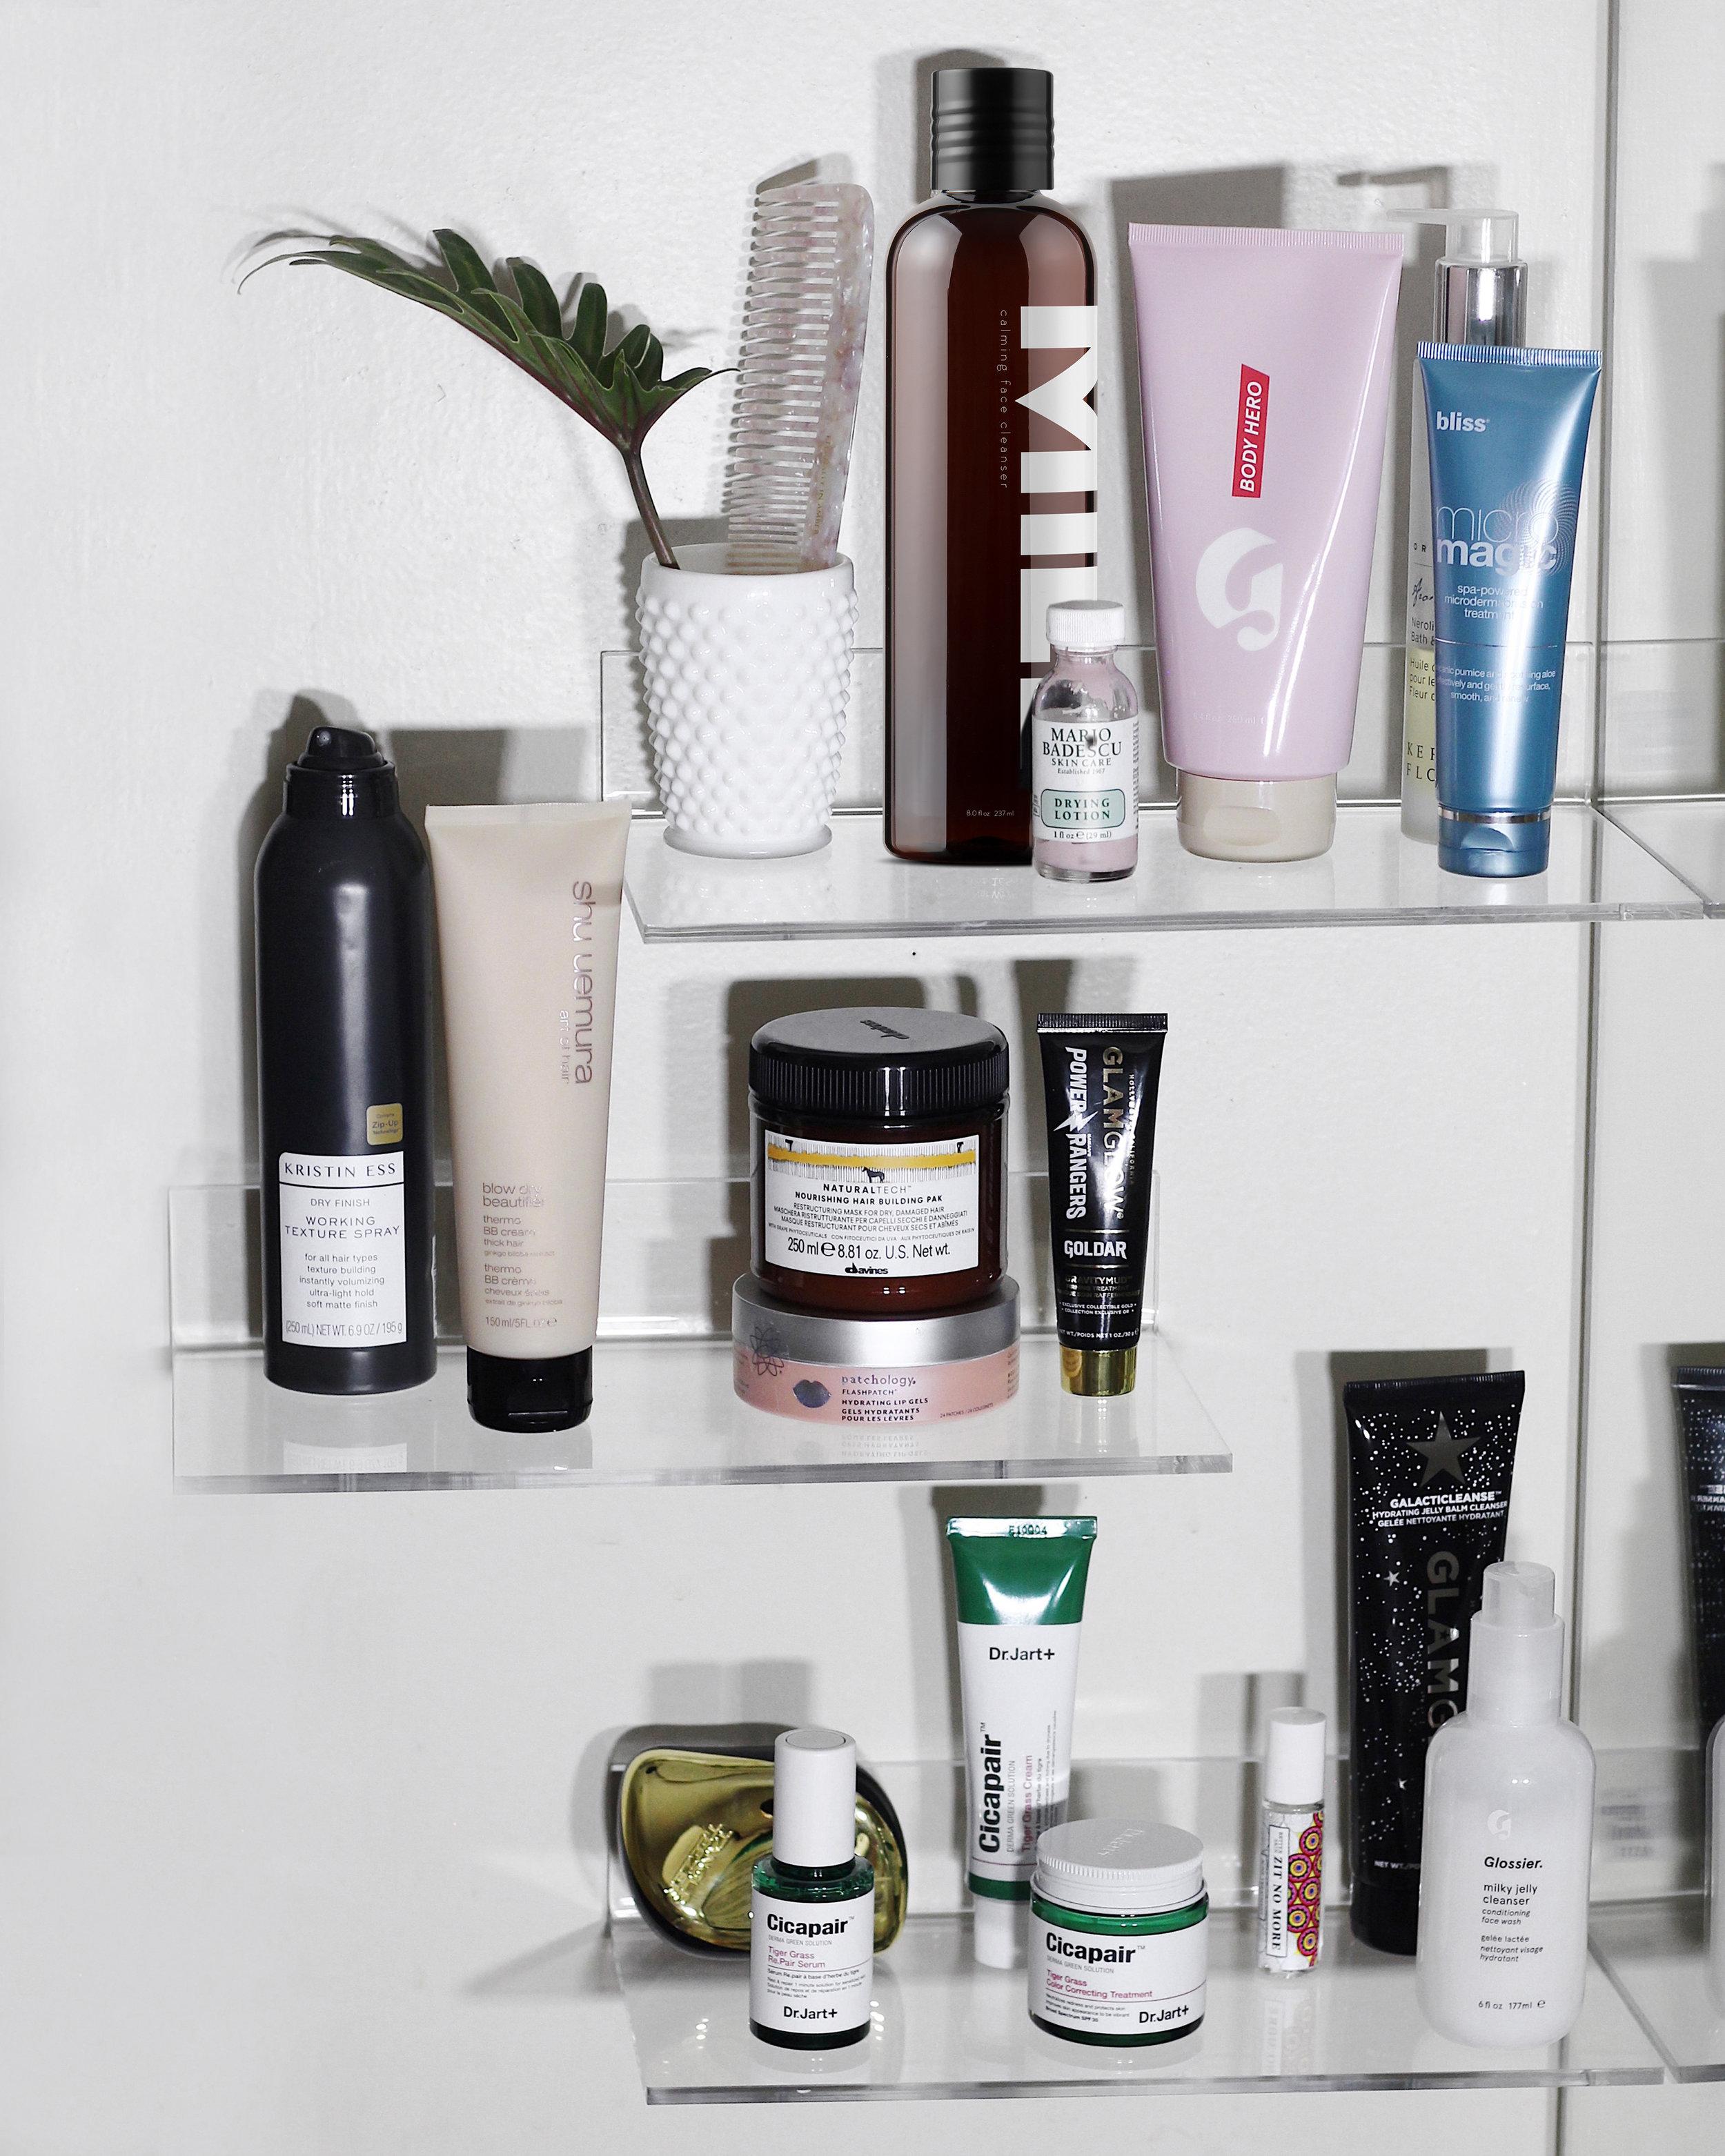 Into-The-Gloss-Top-Shelfie-Mario-Badescu-Glossier-Kerstin-Florian-GLAMGLOW-Dr.-Jart-Shu-Uemura-Davines-Show-Beauty-Kristin-Ess-Hair-Patchology-Eternally-in-Amber-Review.jpg